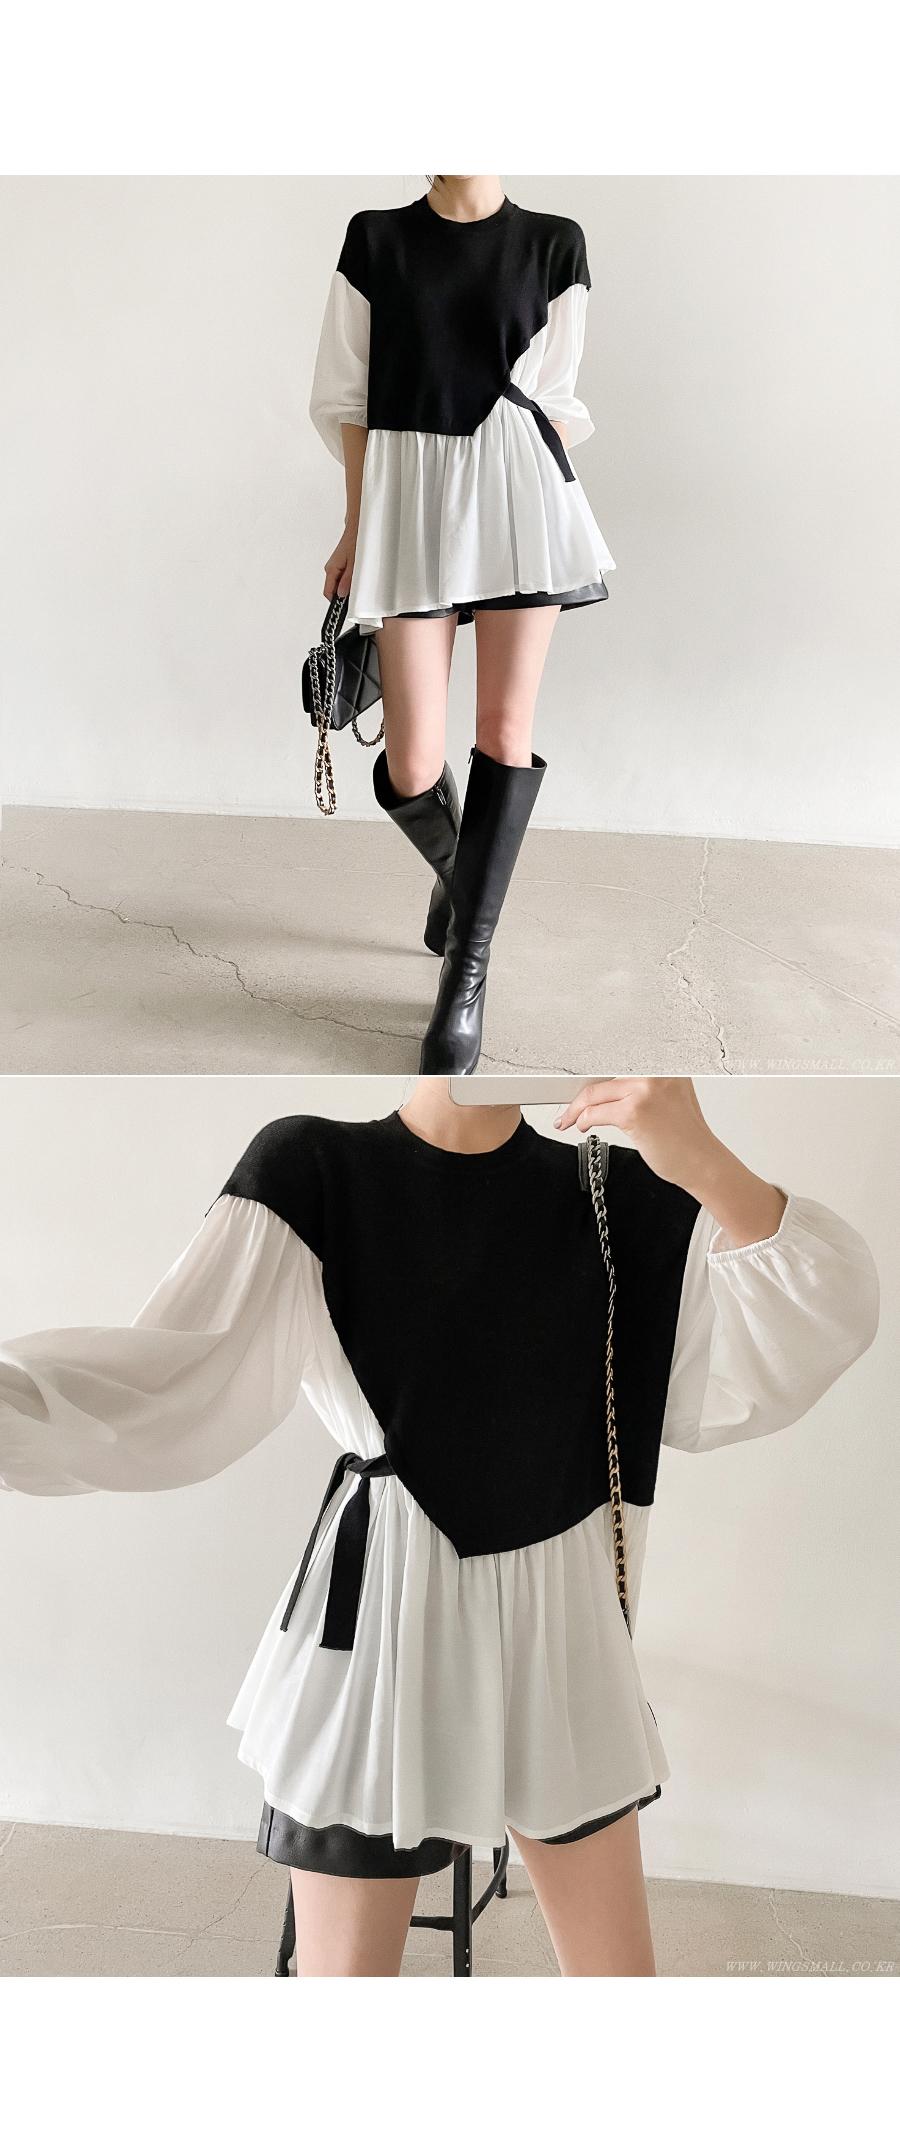 dress model image-S1L13